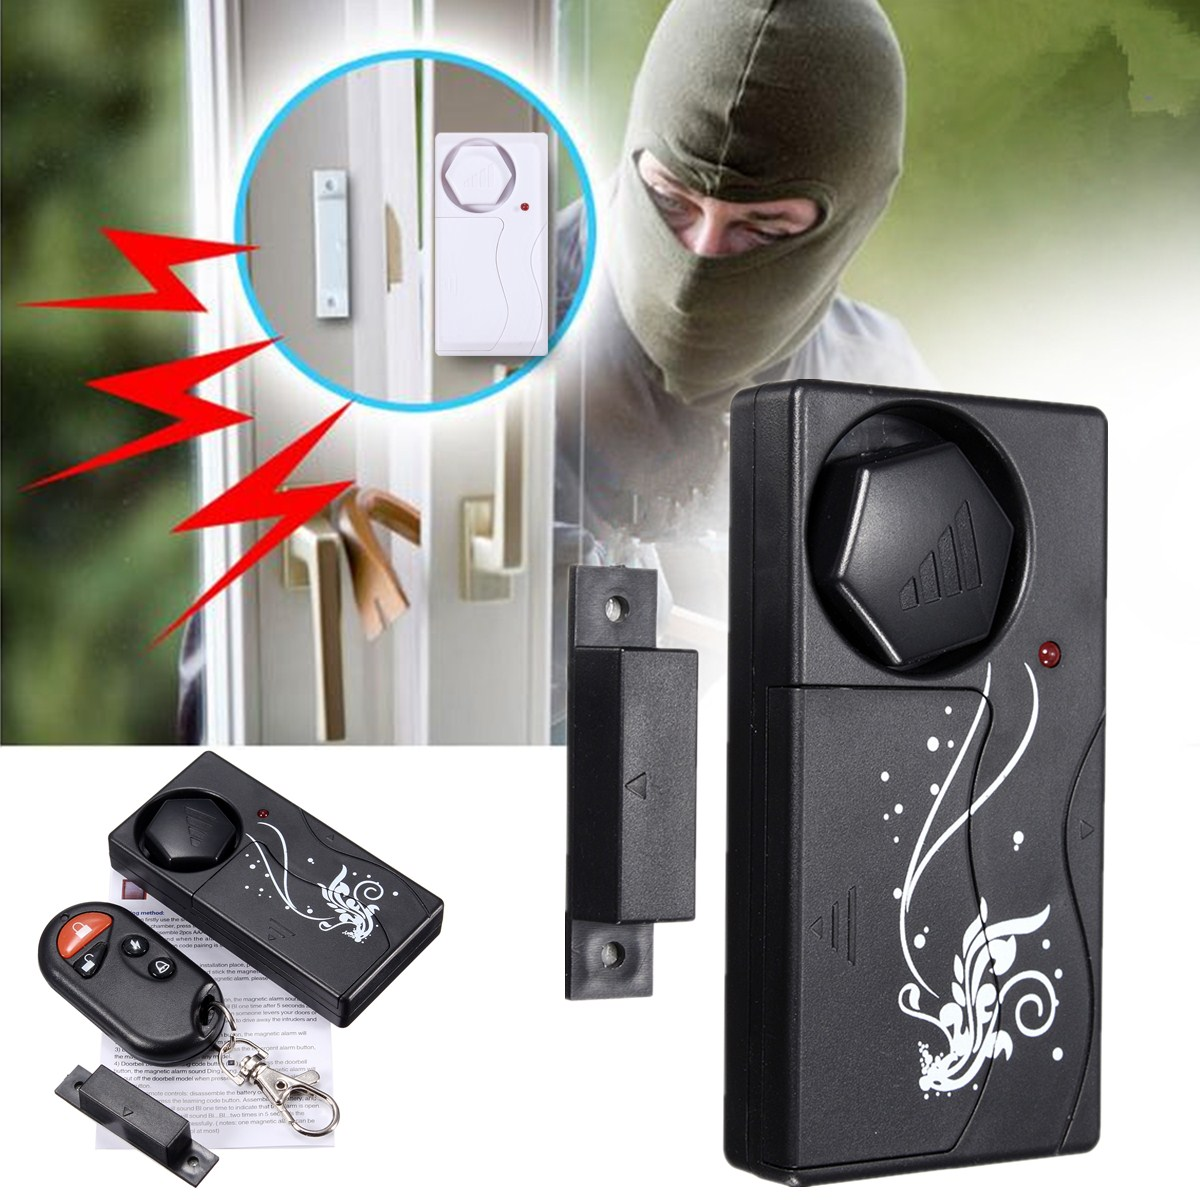 wireless fensteralarm t ralarm fernbedienung alarmanlage. Black Bedroom Furniture Sets. Home Design Ideas